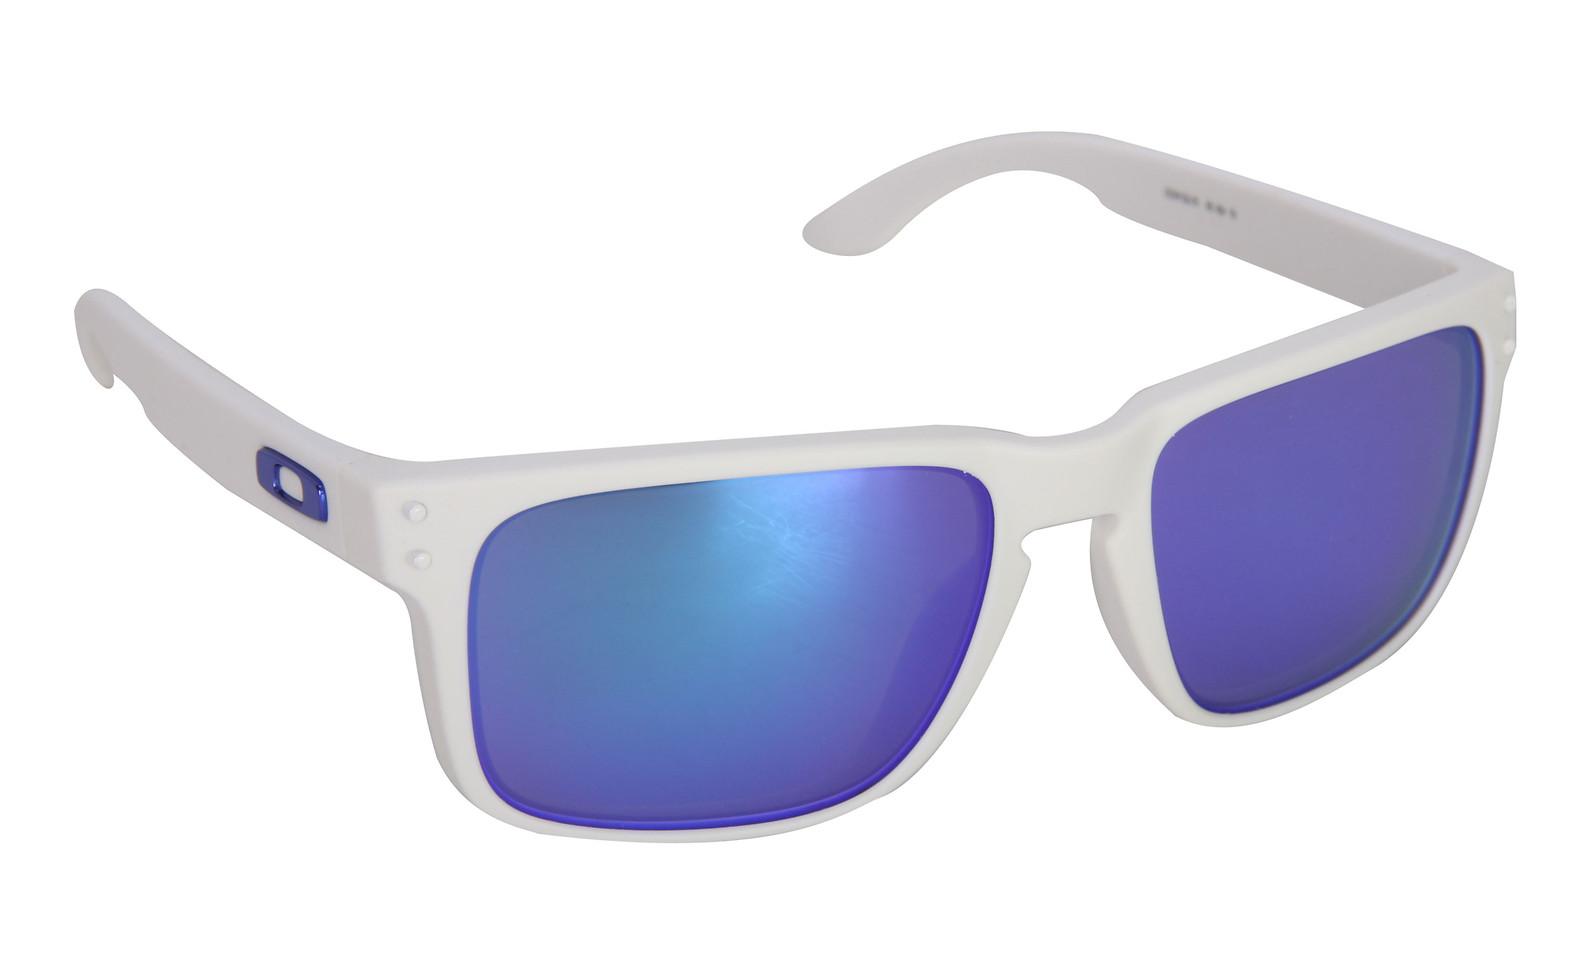 e8fbd8ecb6d7b Oakley Holbrook Sunglasses Matte White Violet Iridium Lens - Reviews ...